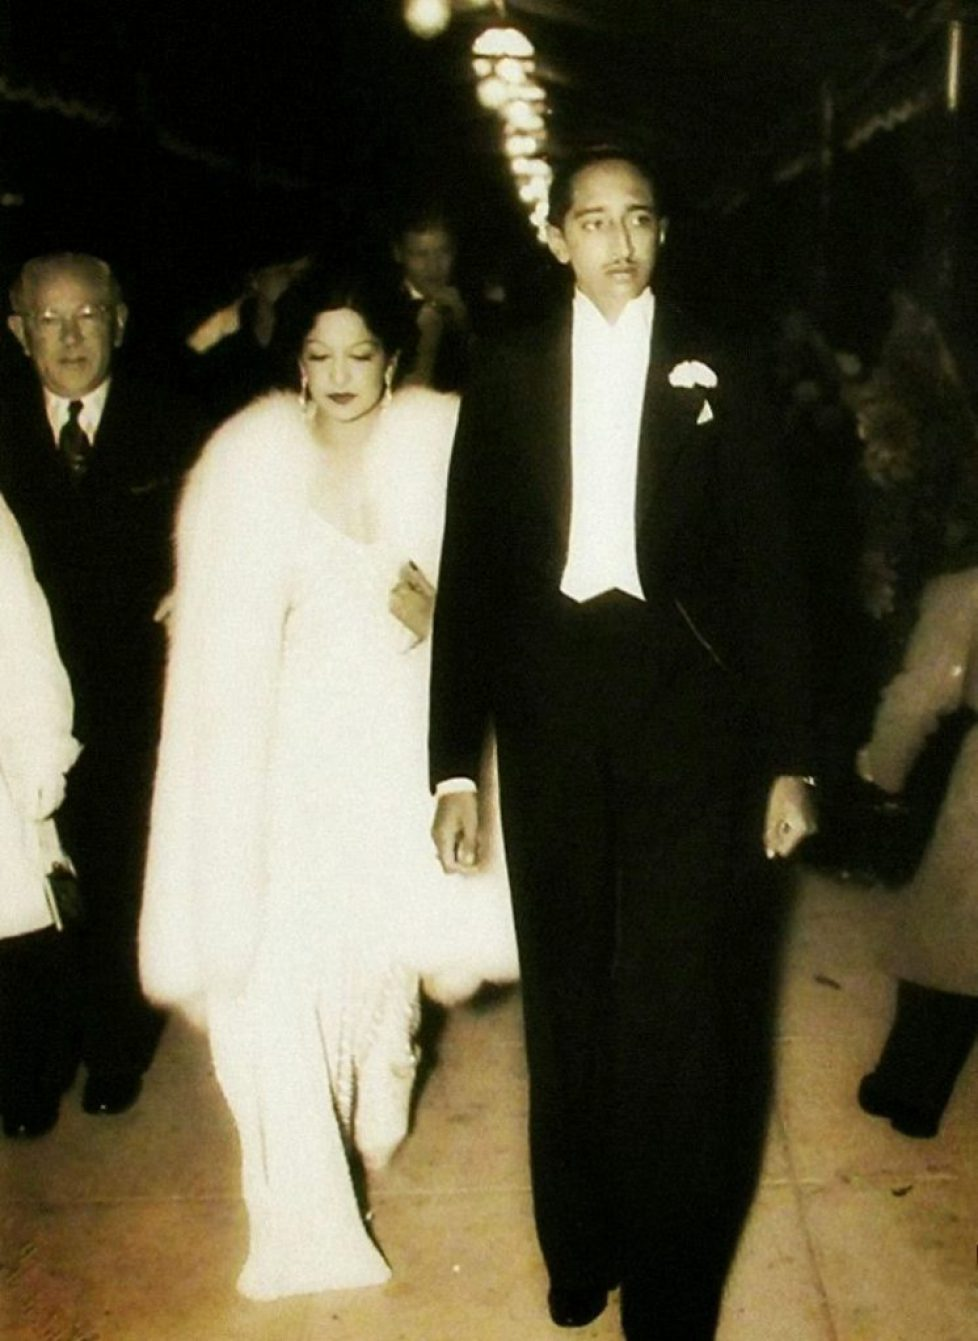 Milind Dombale (Deshmukh) - The Great Holkars - MD2002005 - Maharaja Yashwantrao II Holkar With Maharani Sanyogita Raje Holkar